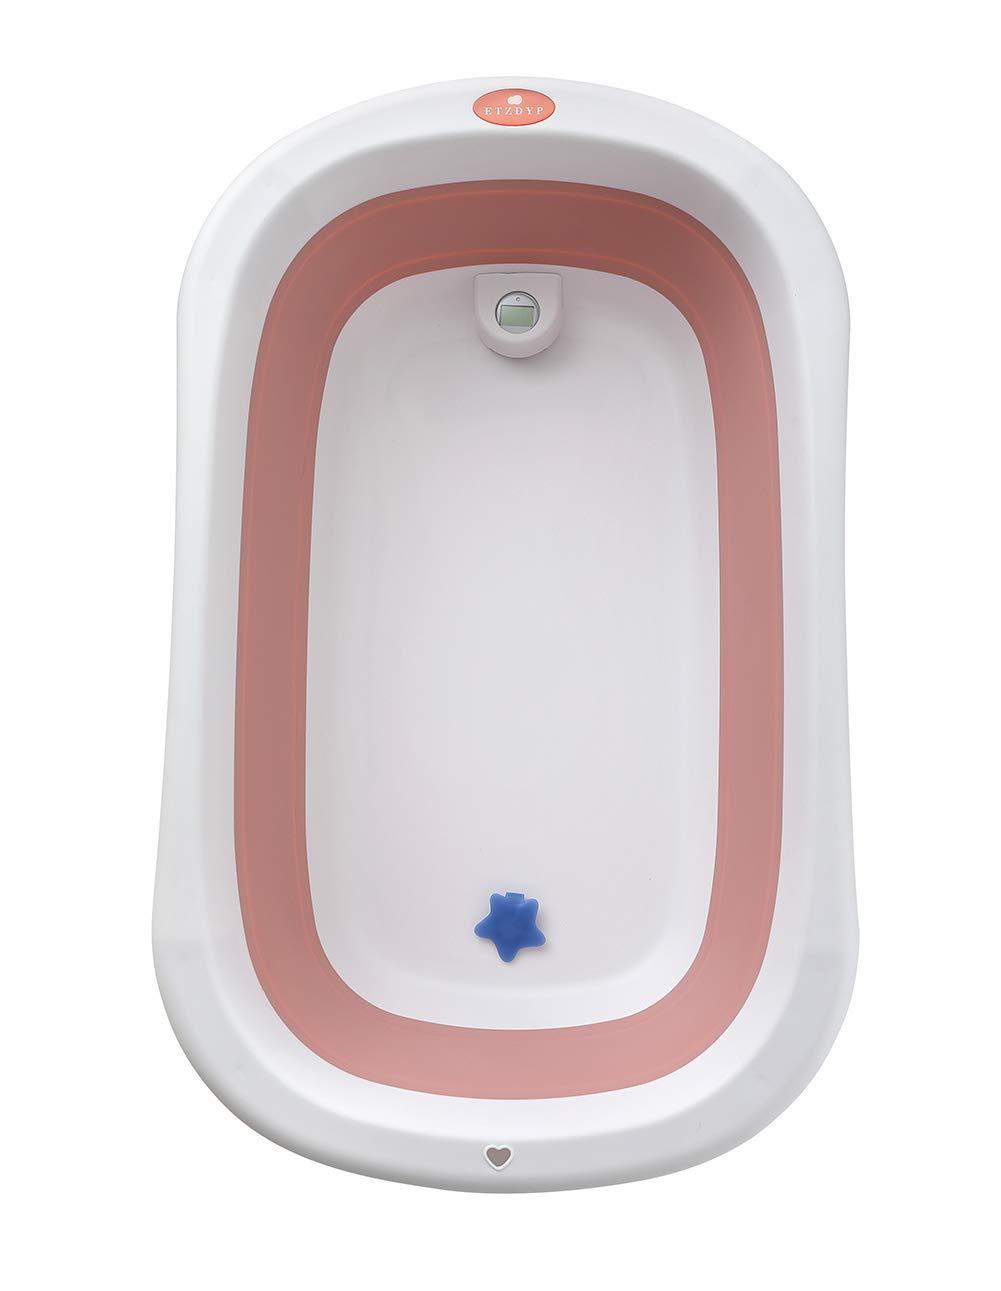 Glenmore Banera de Bebe Plegable con Patas para Ducha Ninos Nina Portatil Grande Infantil Azul